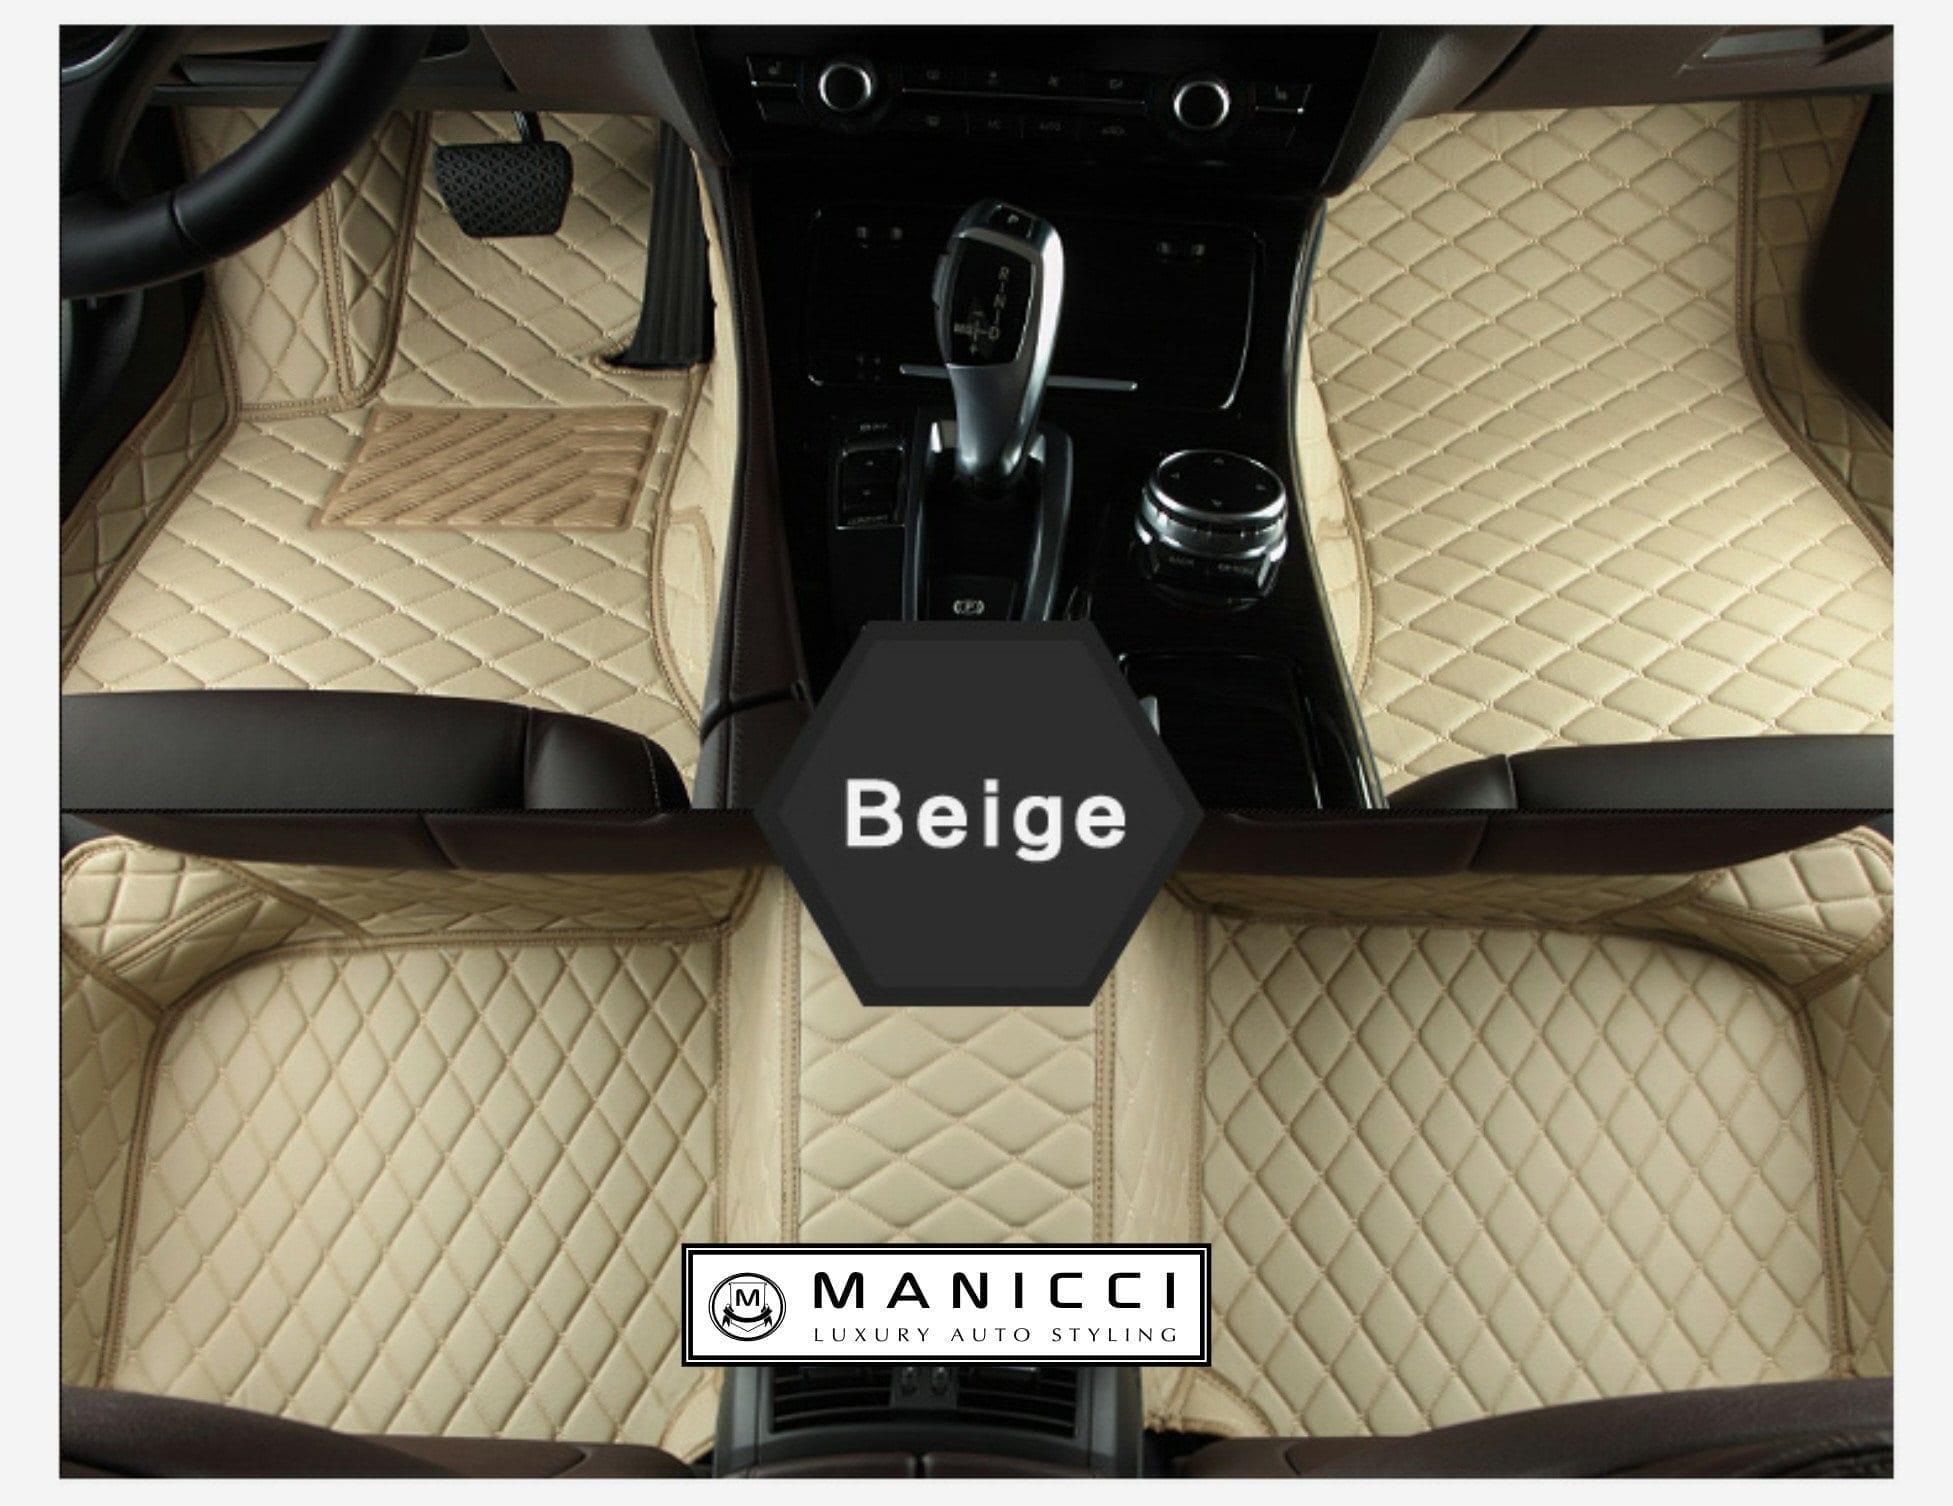 Manicci Luxury Custom Fitted Car Mats Beige Diamond